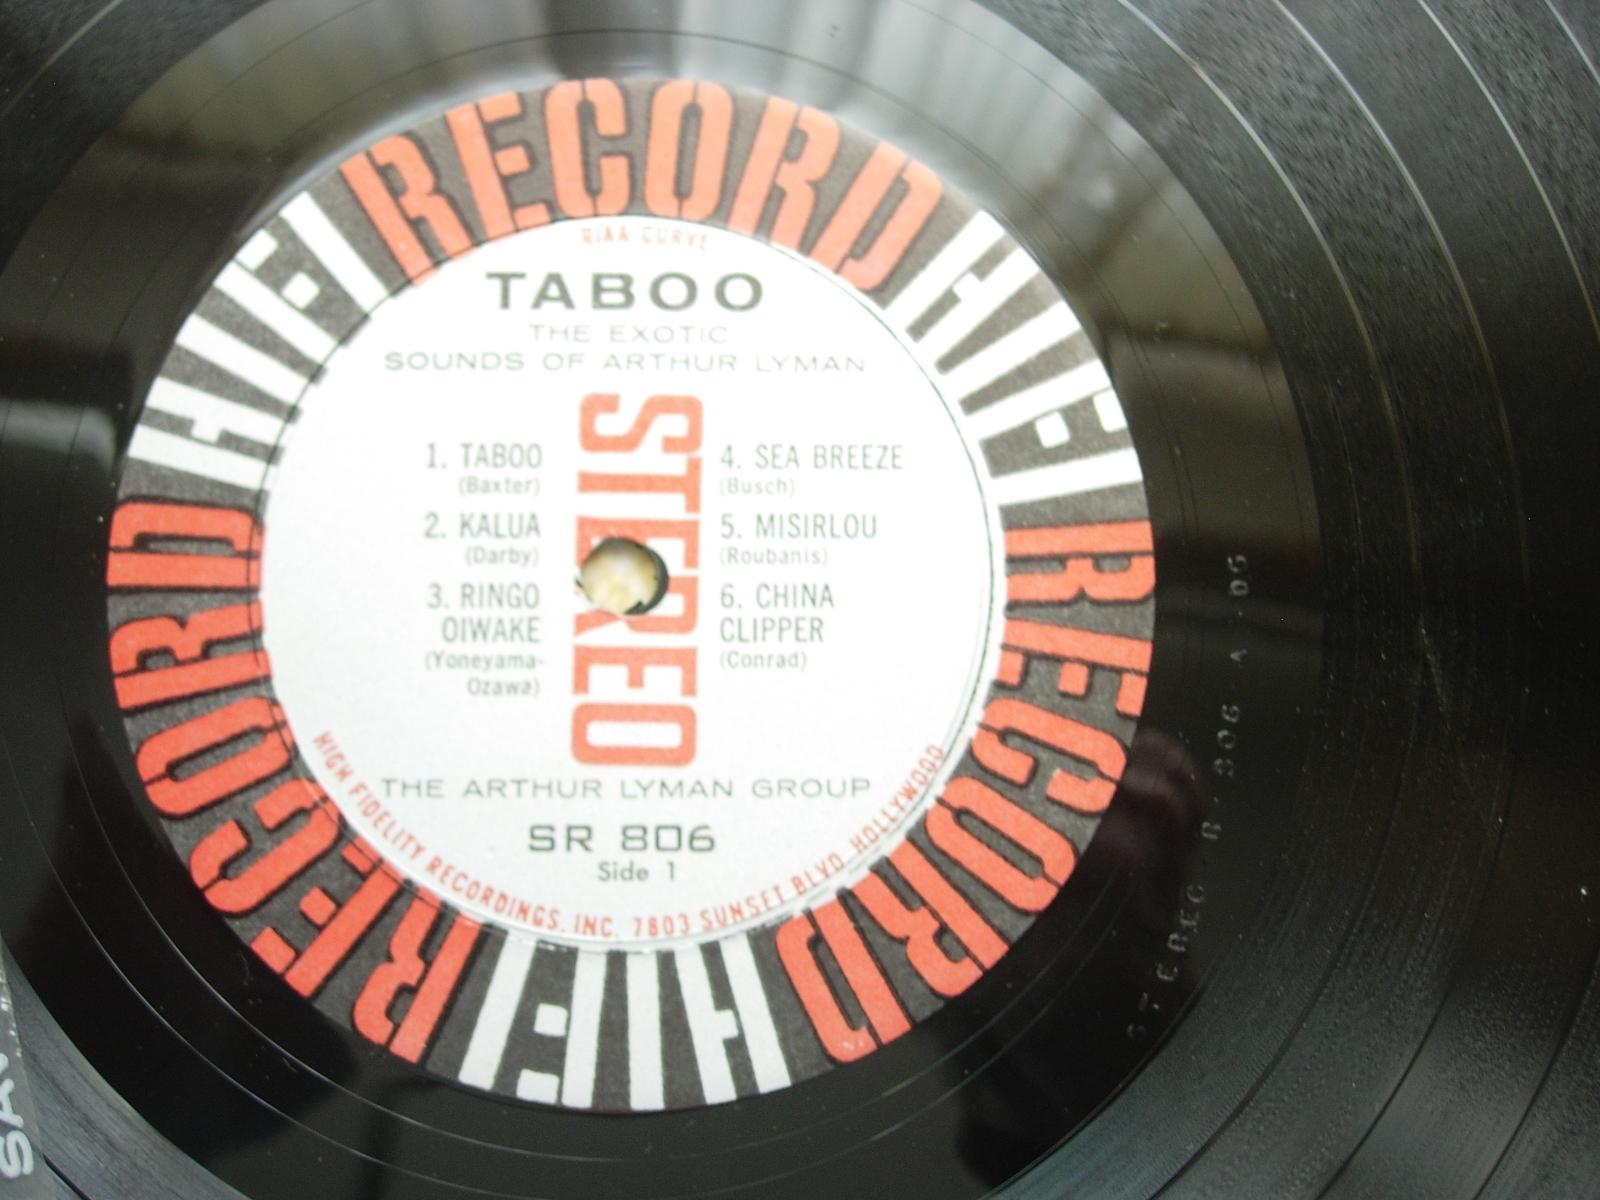 TABOO The Exotic Sounds of Arthur Lyman - HiFi Record R806